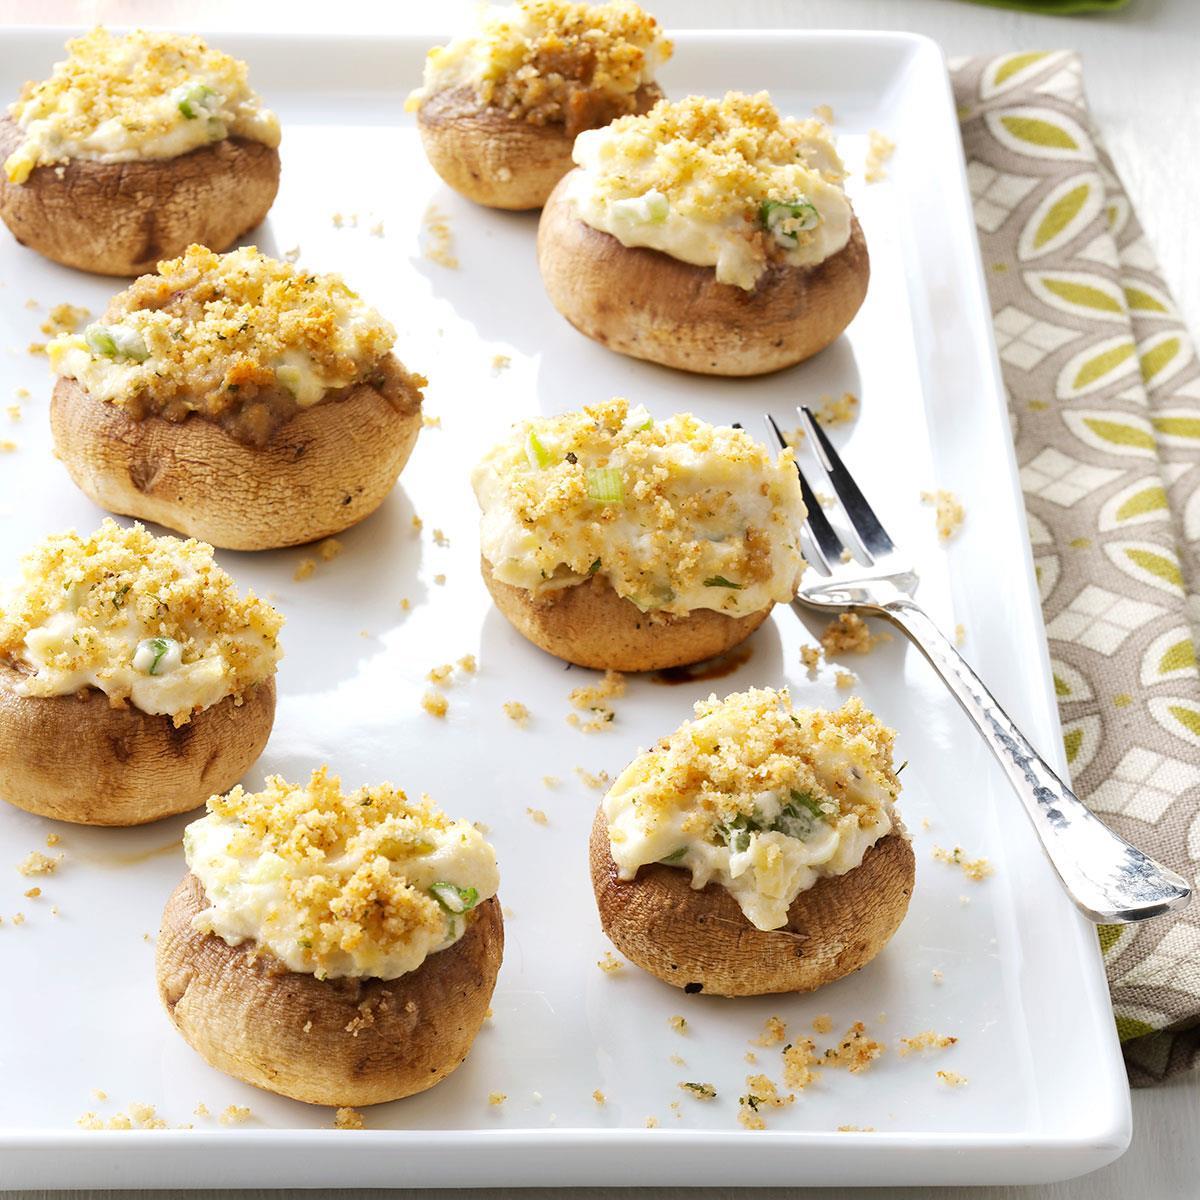 Artichoke Mushroom Caps Recipe | Taste of Home